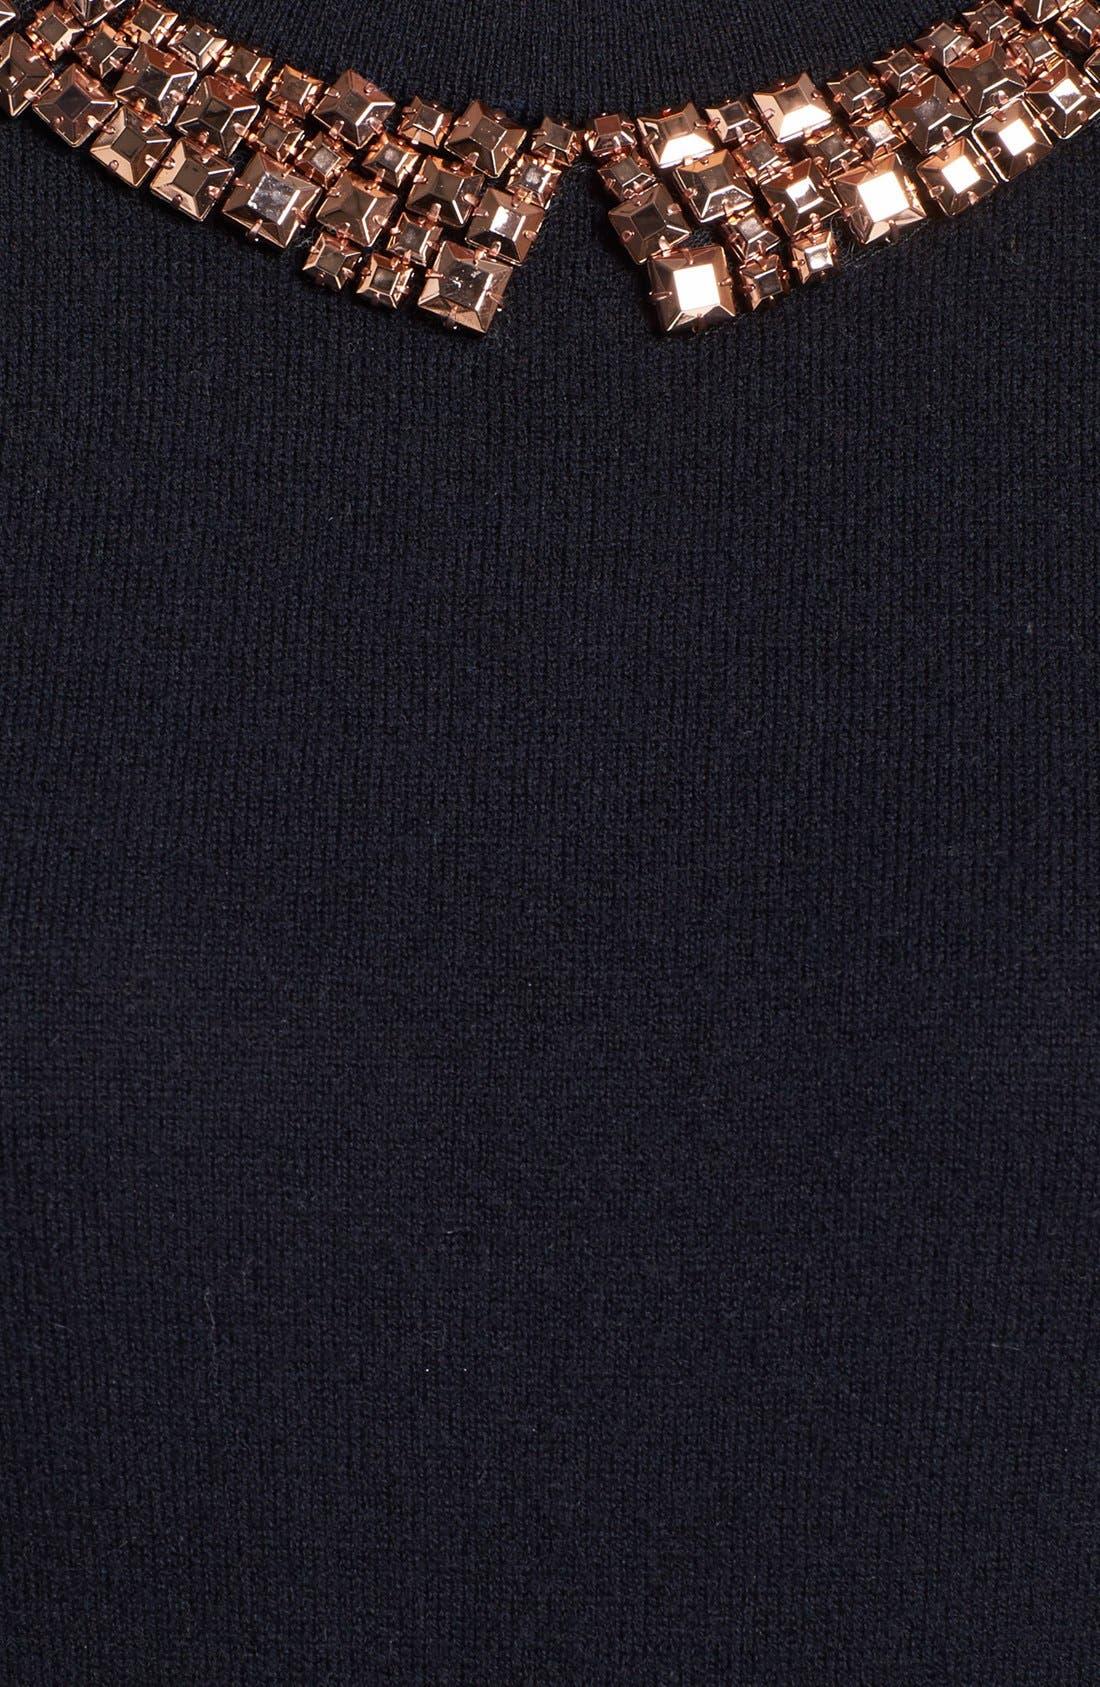 Alternate Image 3  - kate spade new york 'avaline' embellished sweater